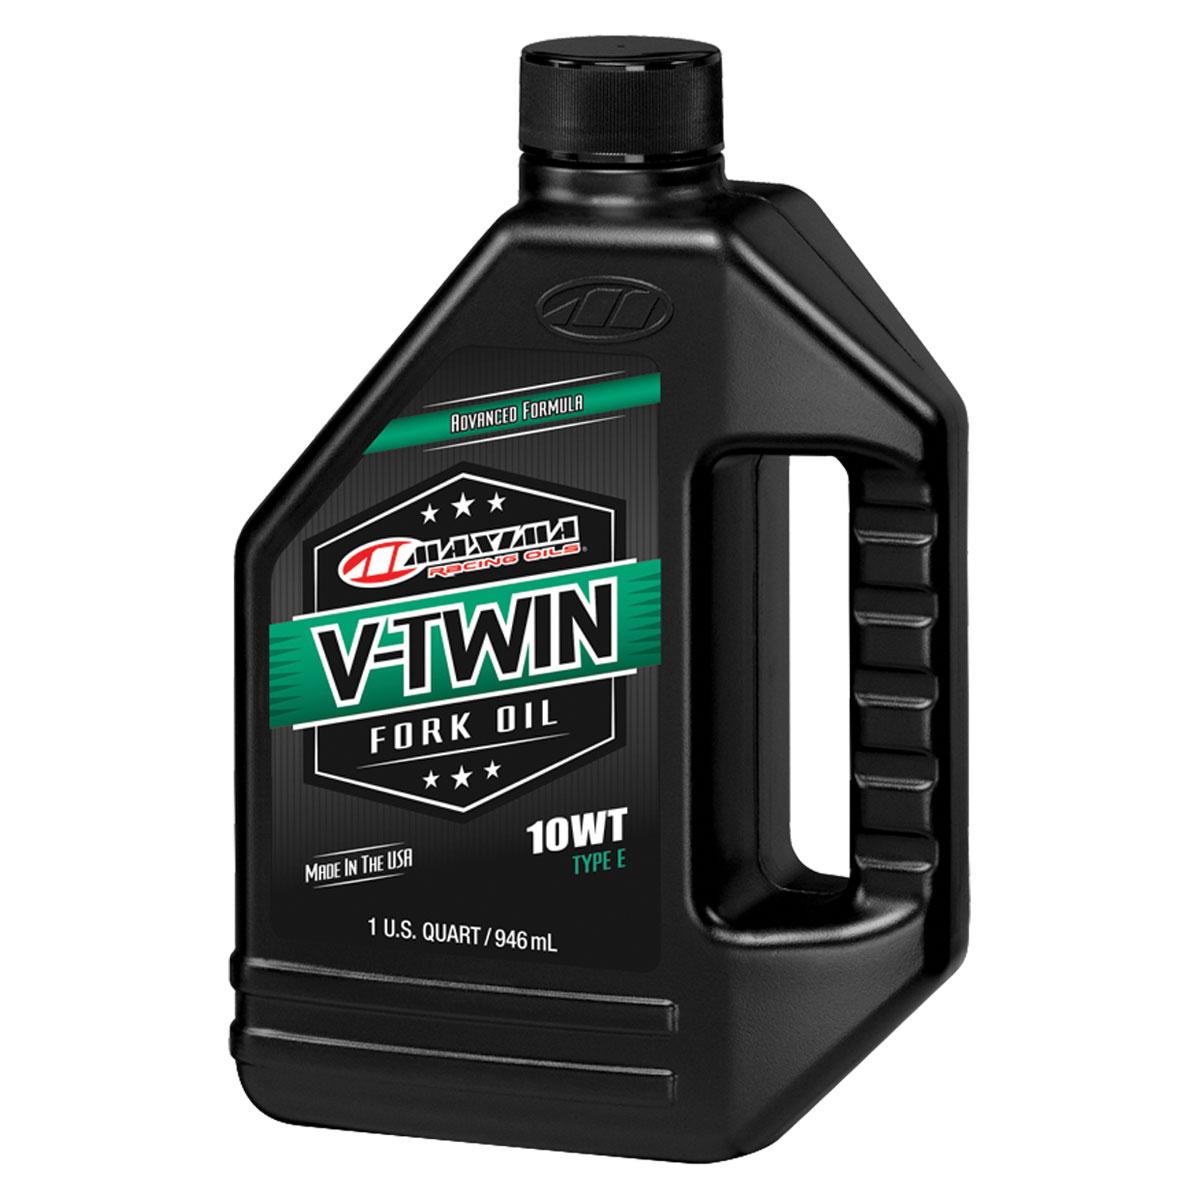 Maxima 10W Fork Oil Quart